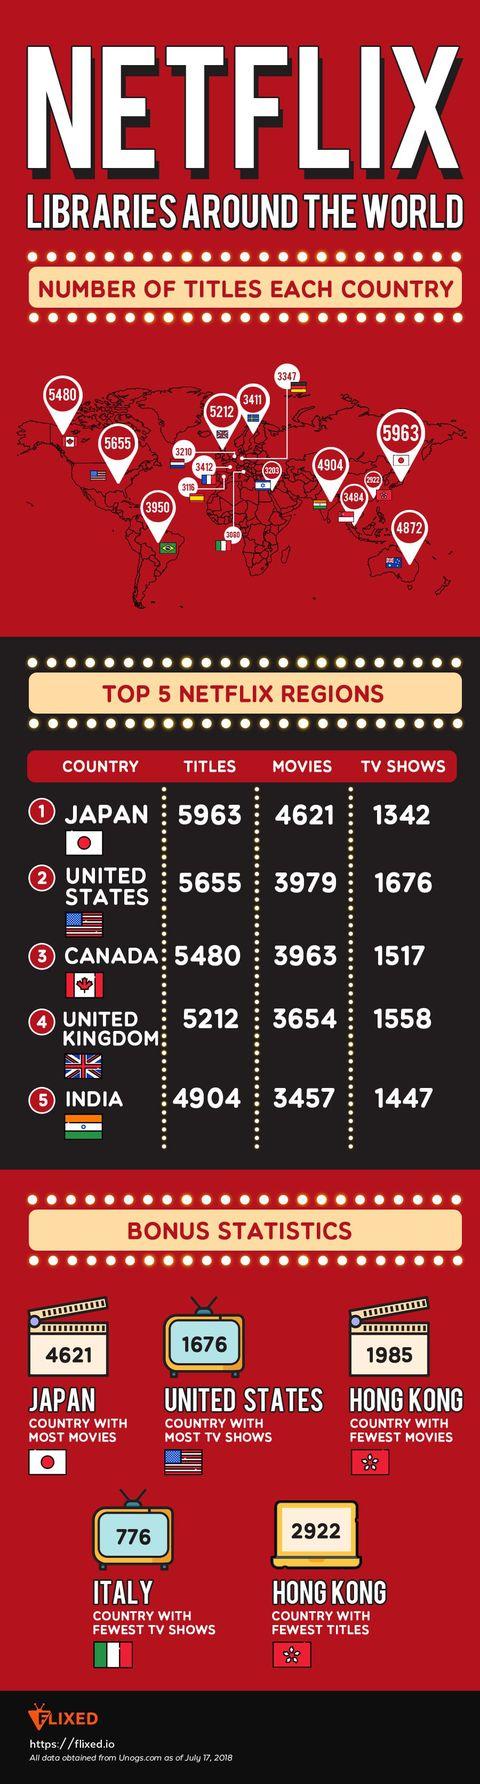 Japan Has the World's Largest Netflix Catalog